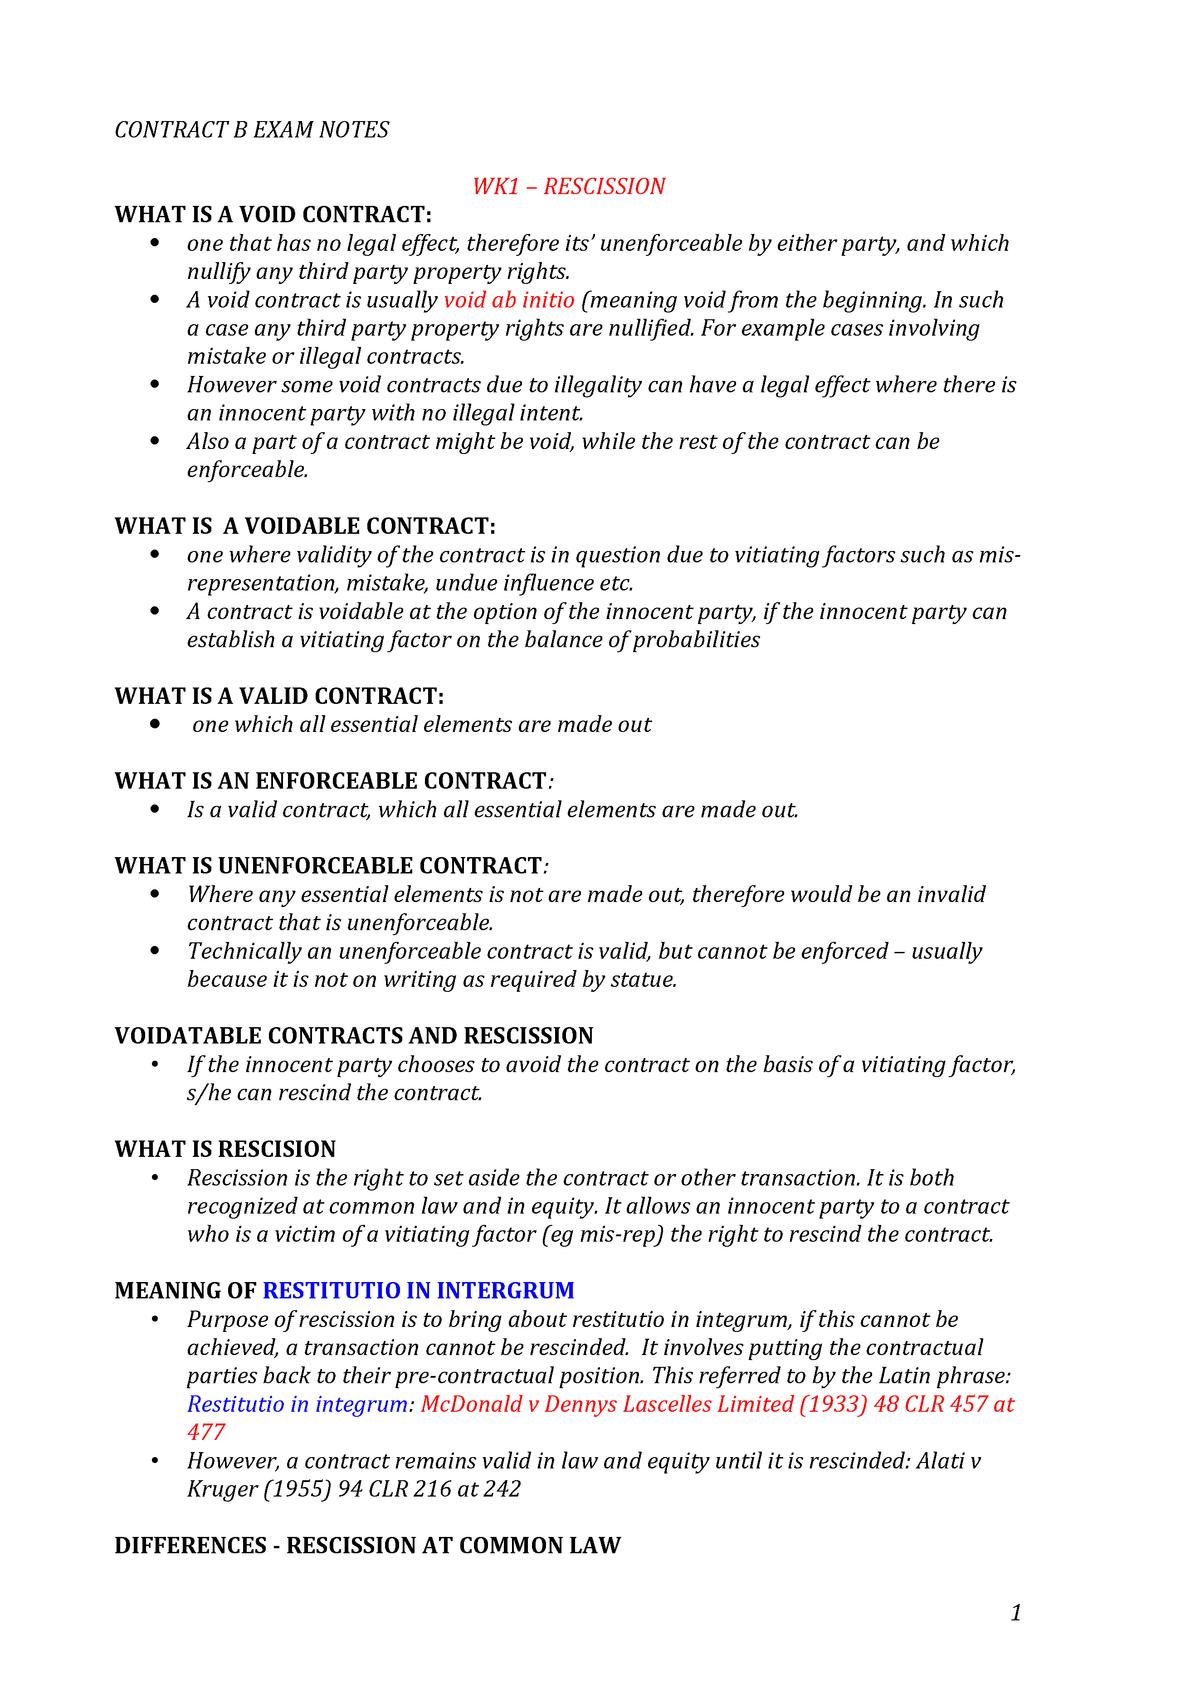 LAW2CTB-Timi Exam notes - LAW2CTB Contract Law B - LaTrobe